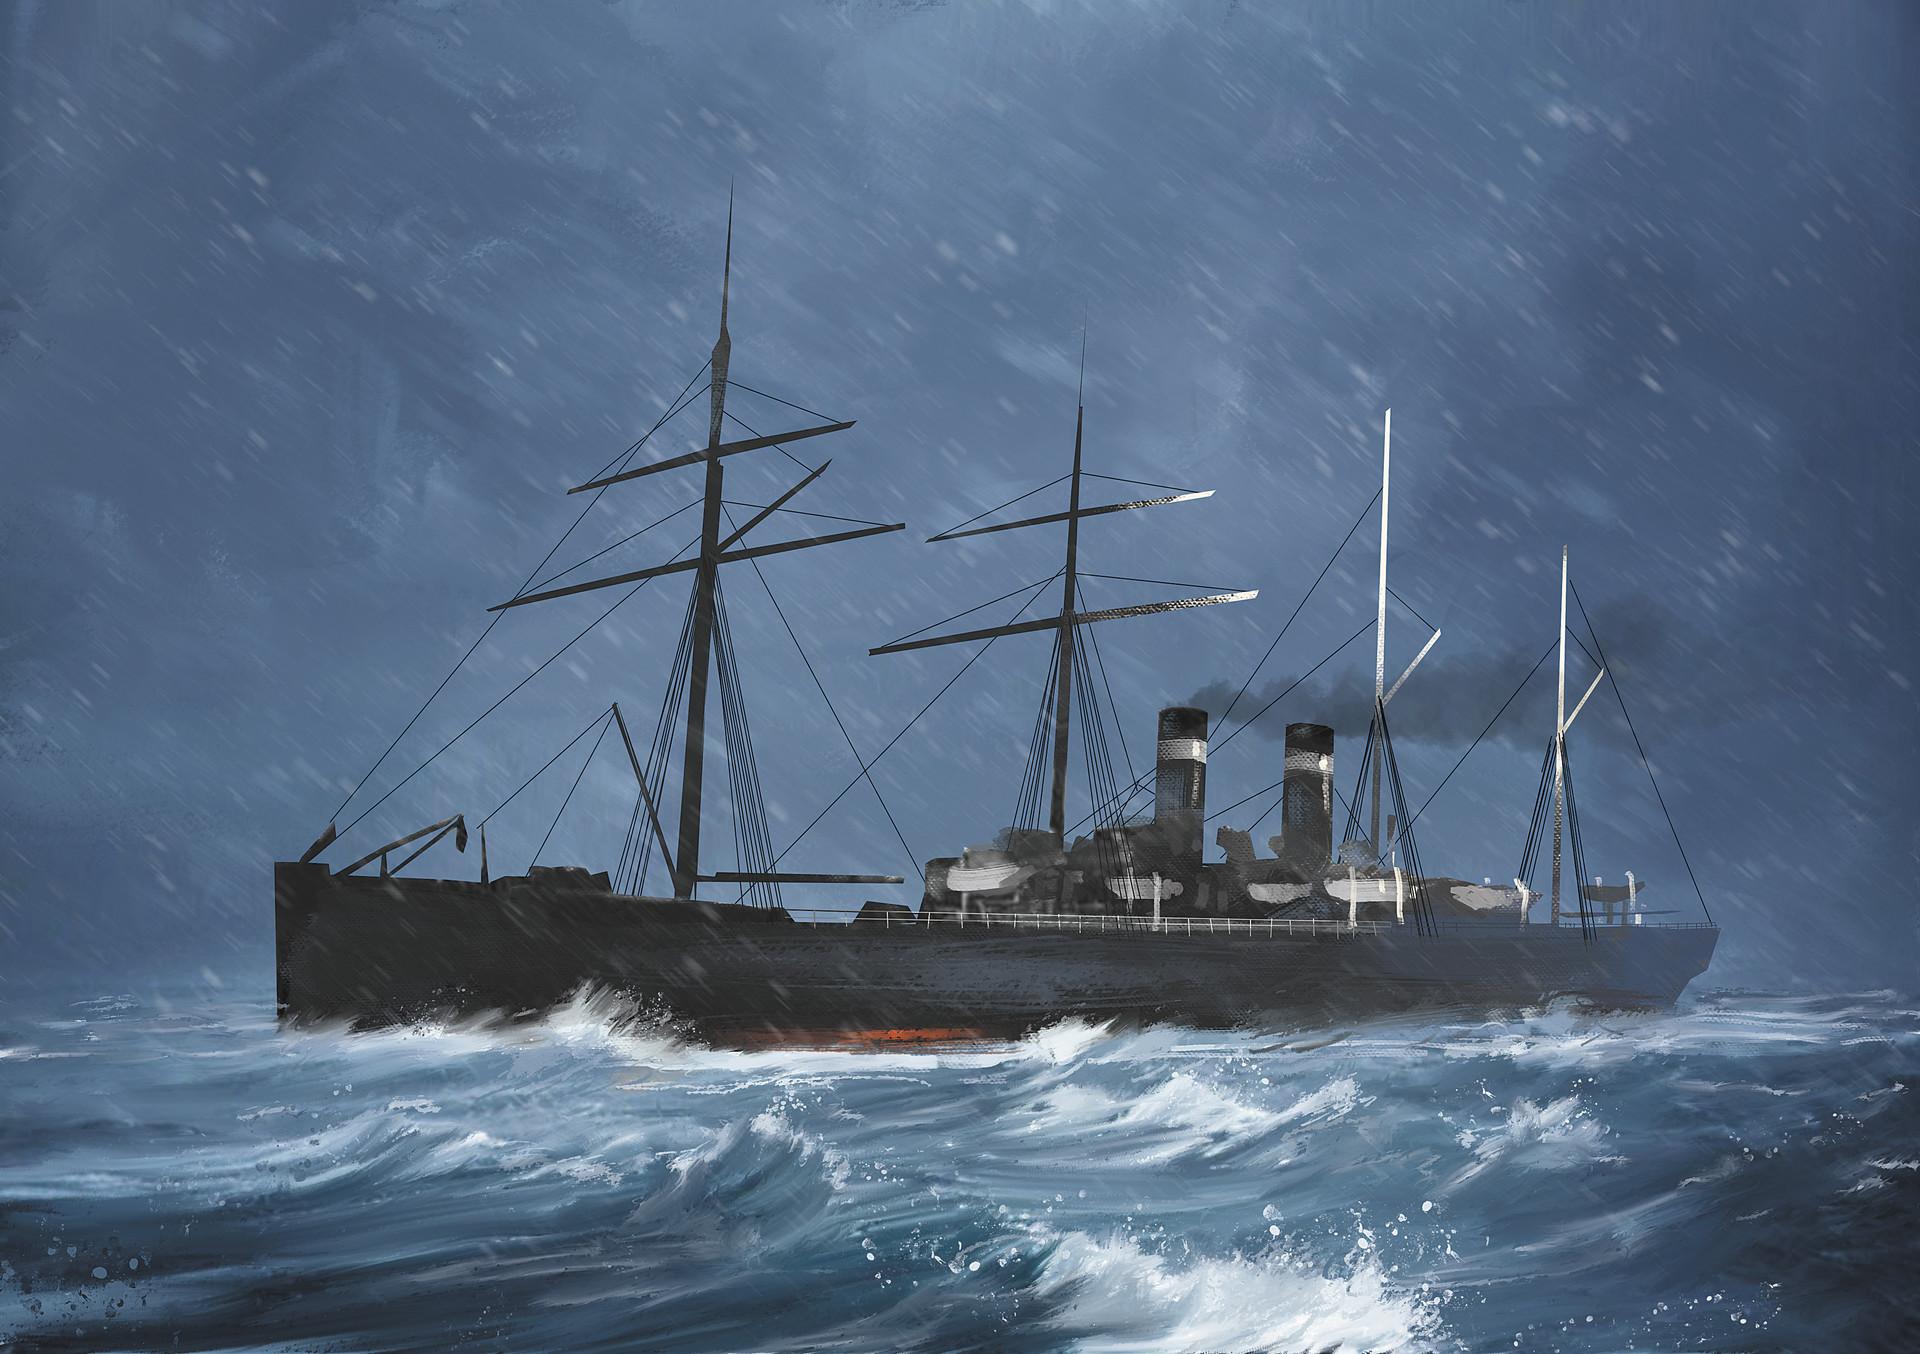 Dominik mayer 1879 arizona 02